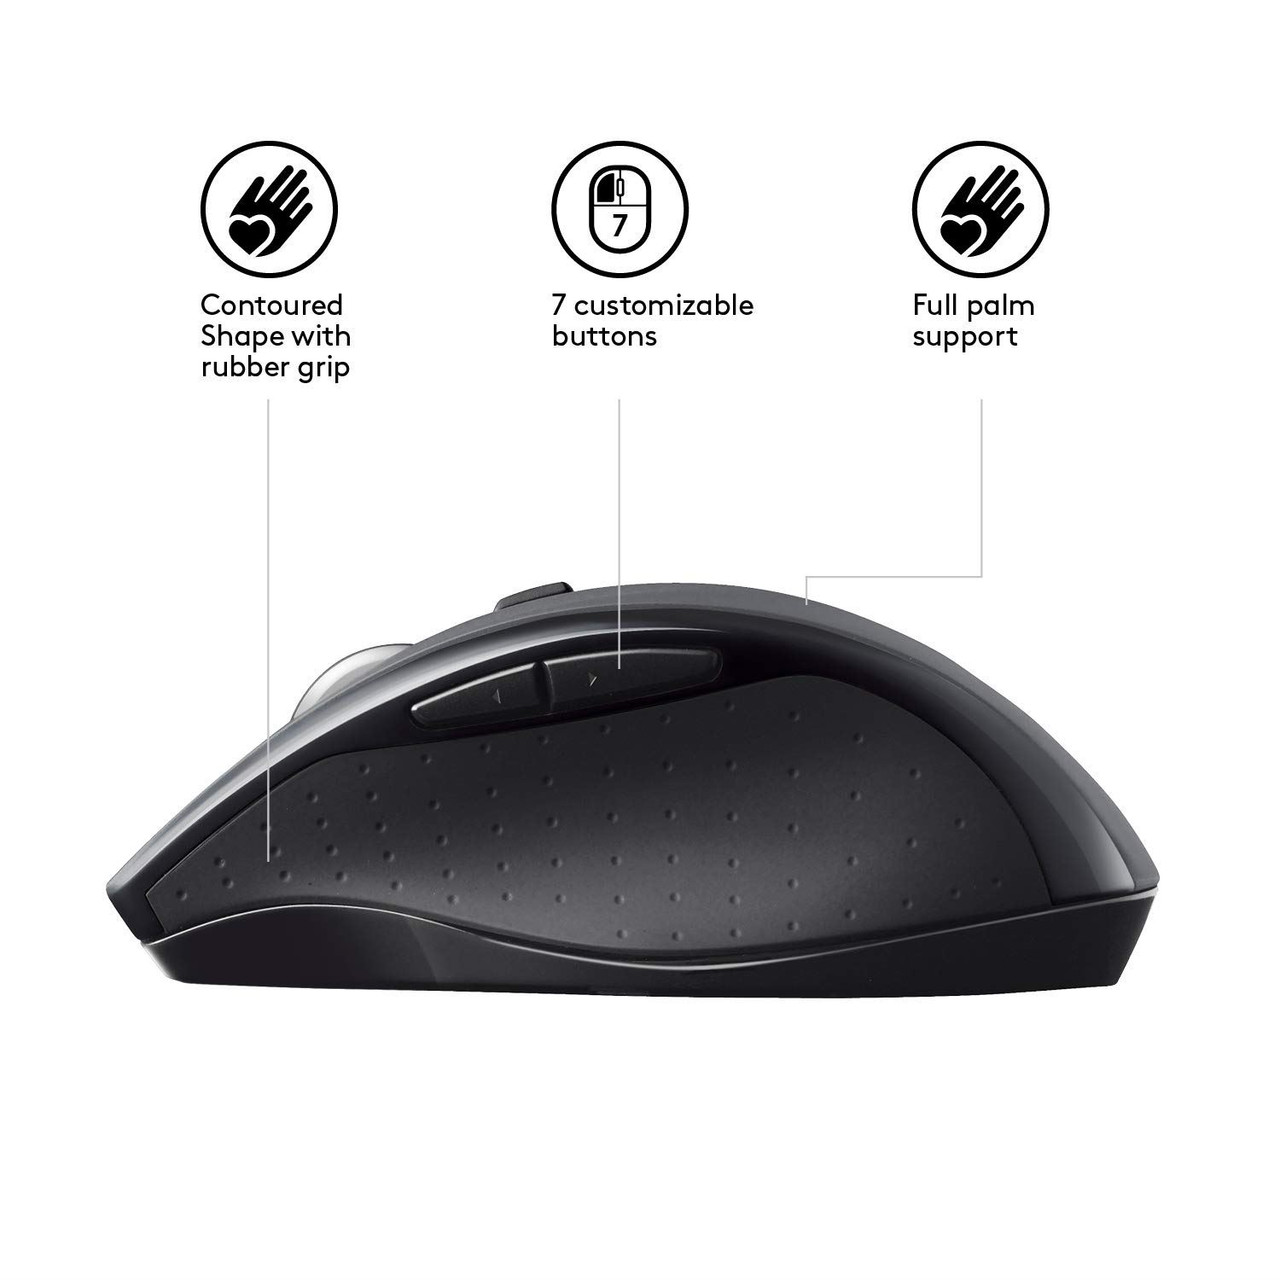 Logitech Marathon M705 Wireless USB Unifying Hyperfast Scrolling Mouse